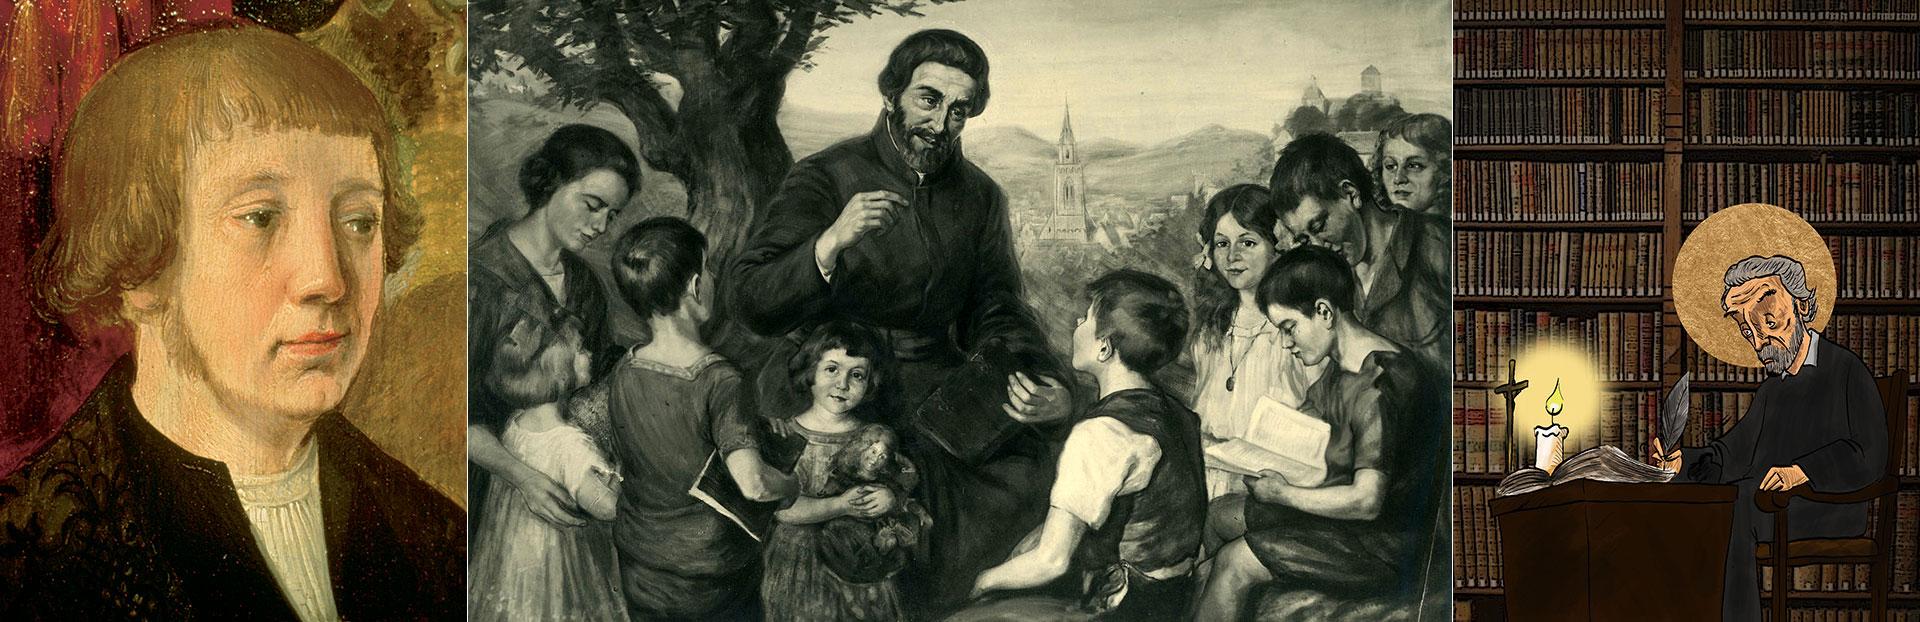 Pedro Canisio 1521-2021 – Un gigante